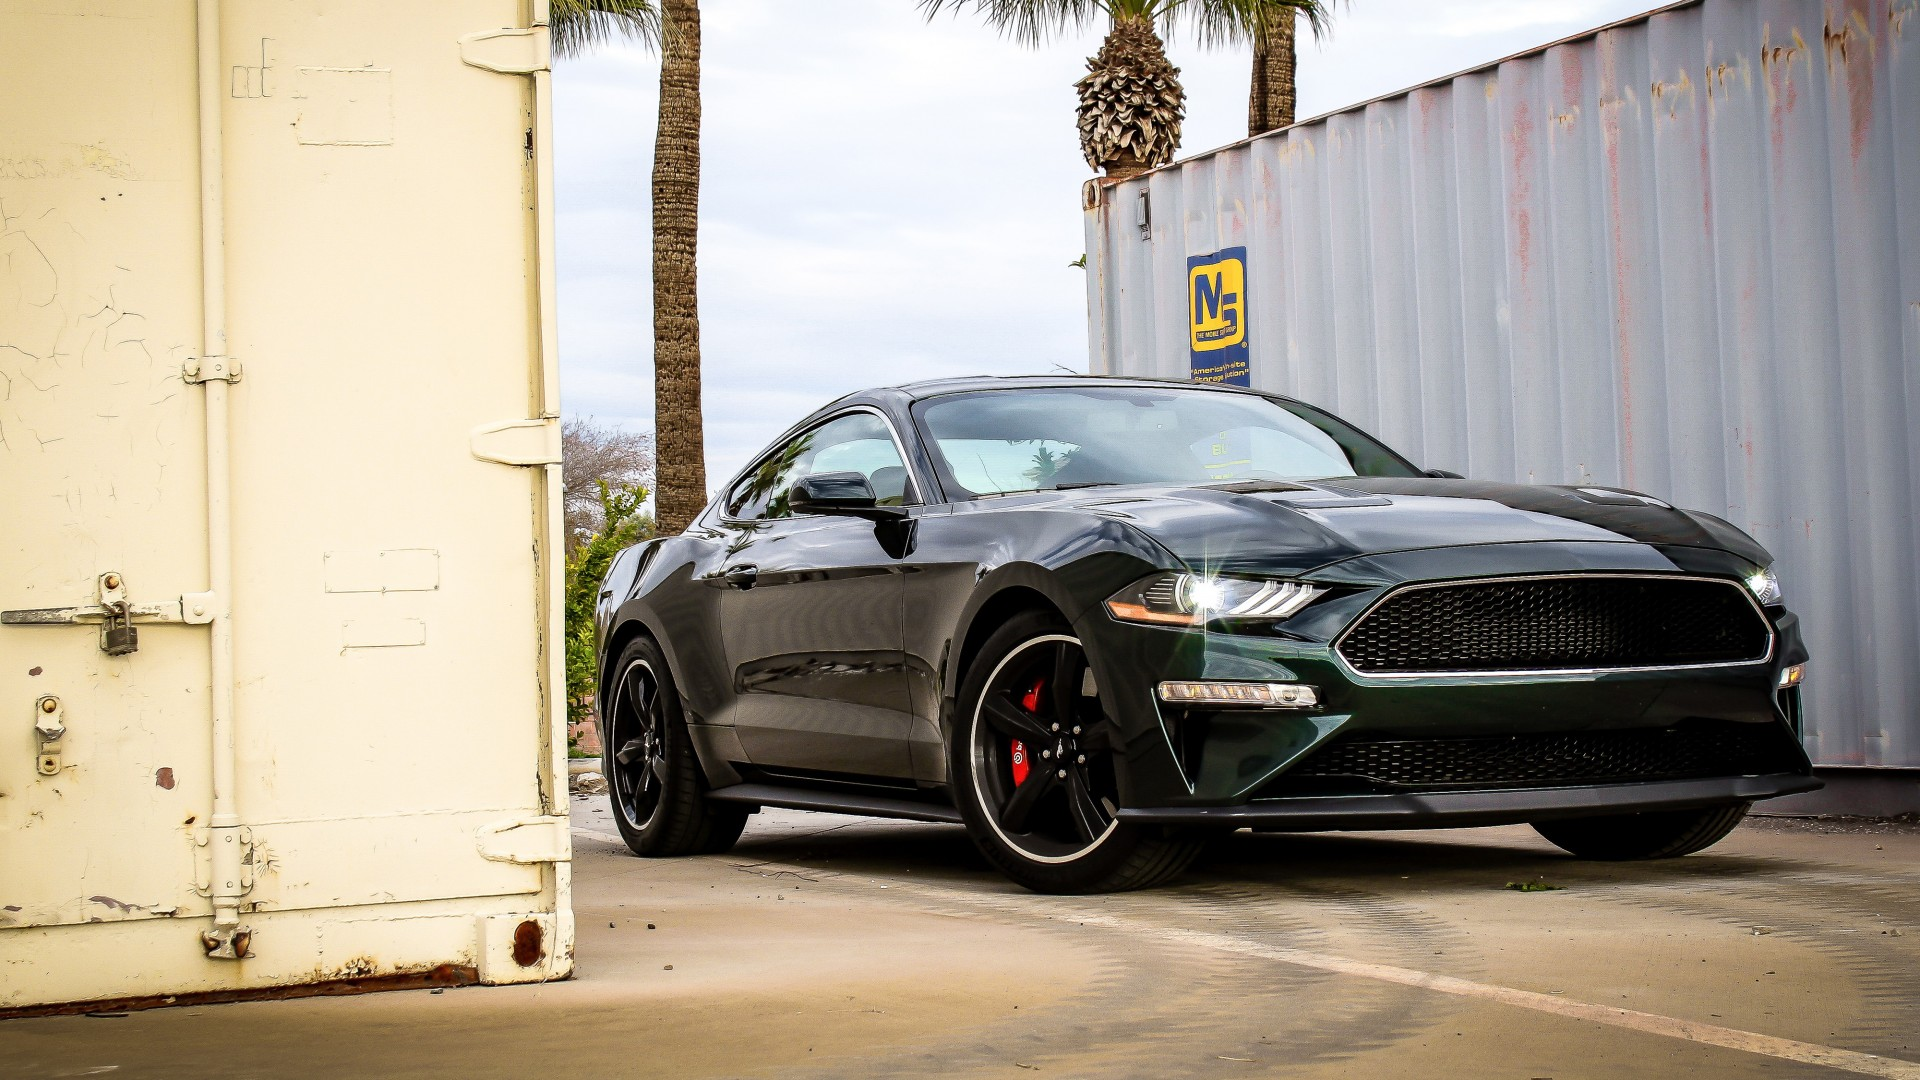 Ford Escape Ecoboost >> 2019 Ford Mustang Bullitt 4K Wallpaper | HD Car Wallpapers | ID #12598